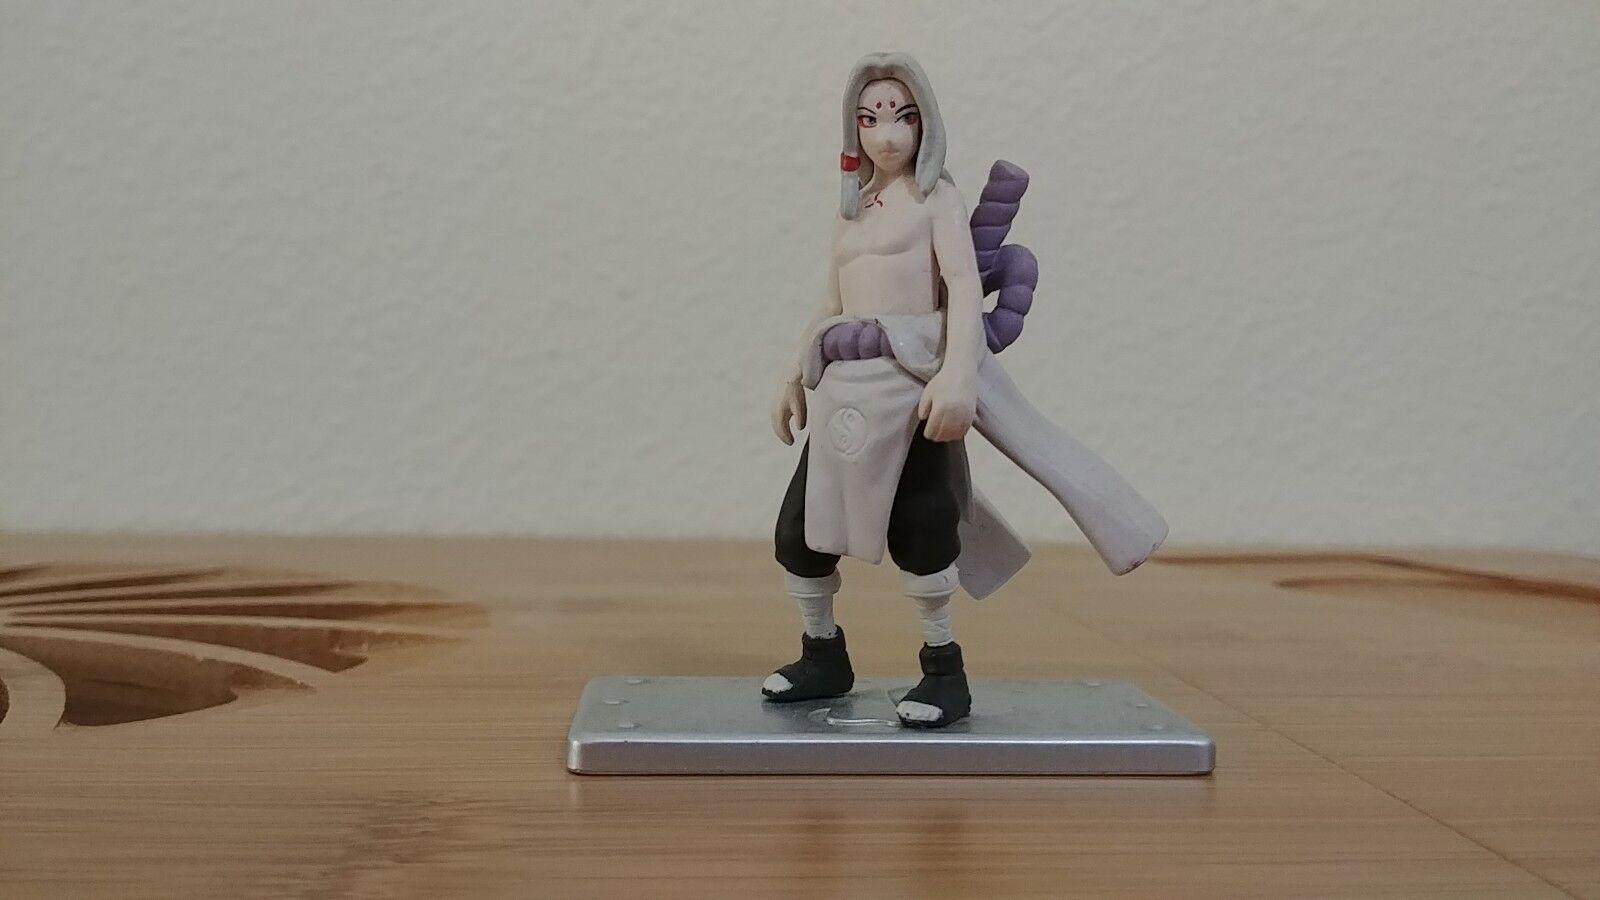 Naruto Shippuden Kimimaro Figure - Used